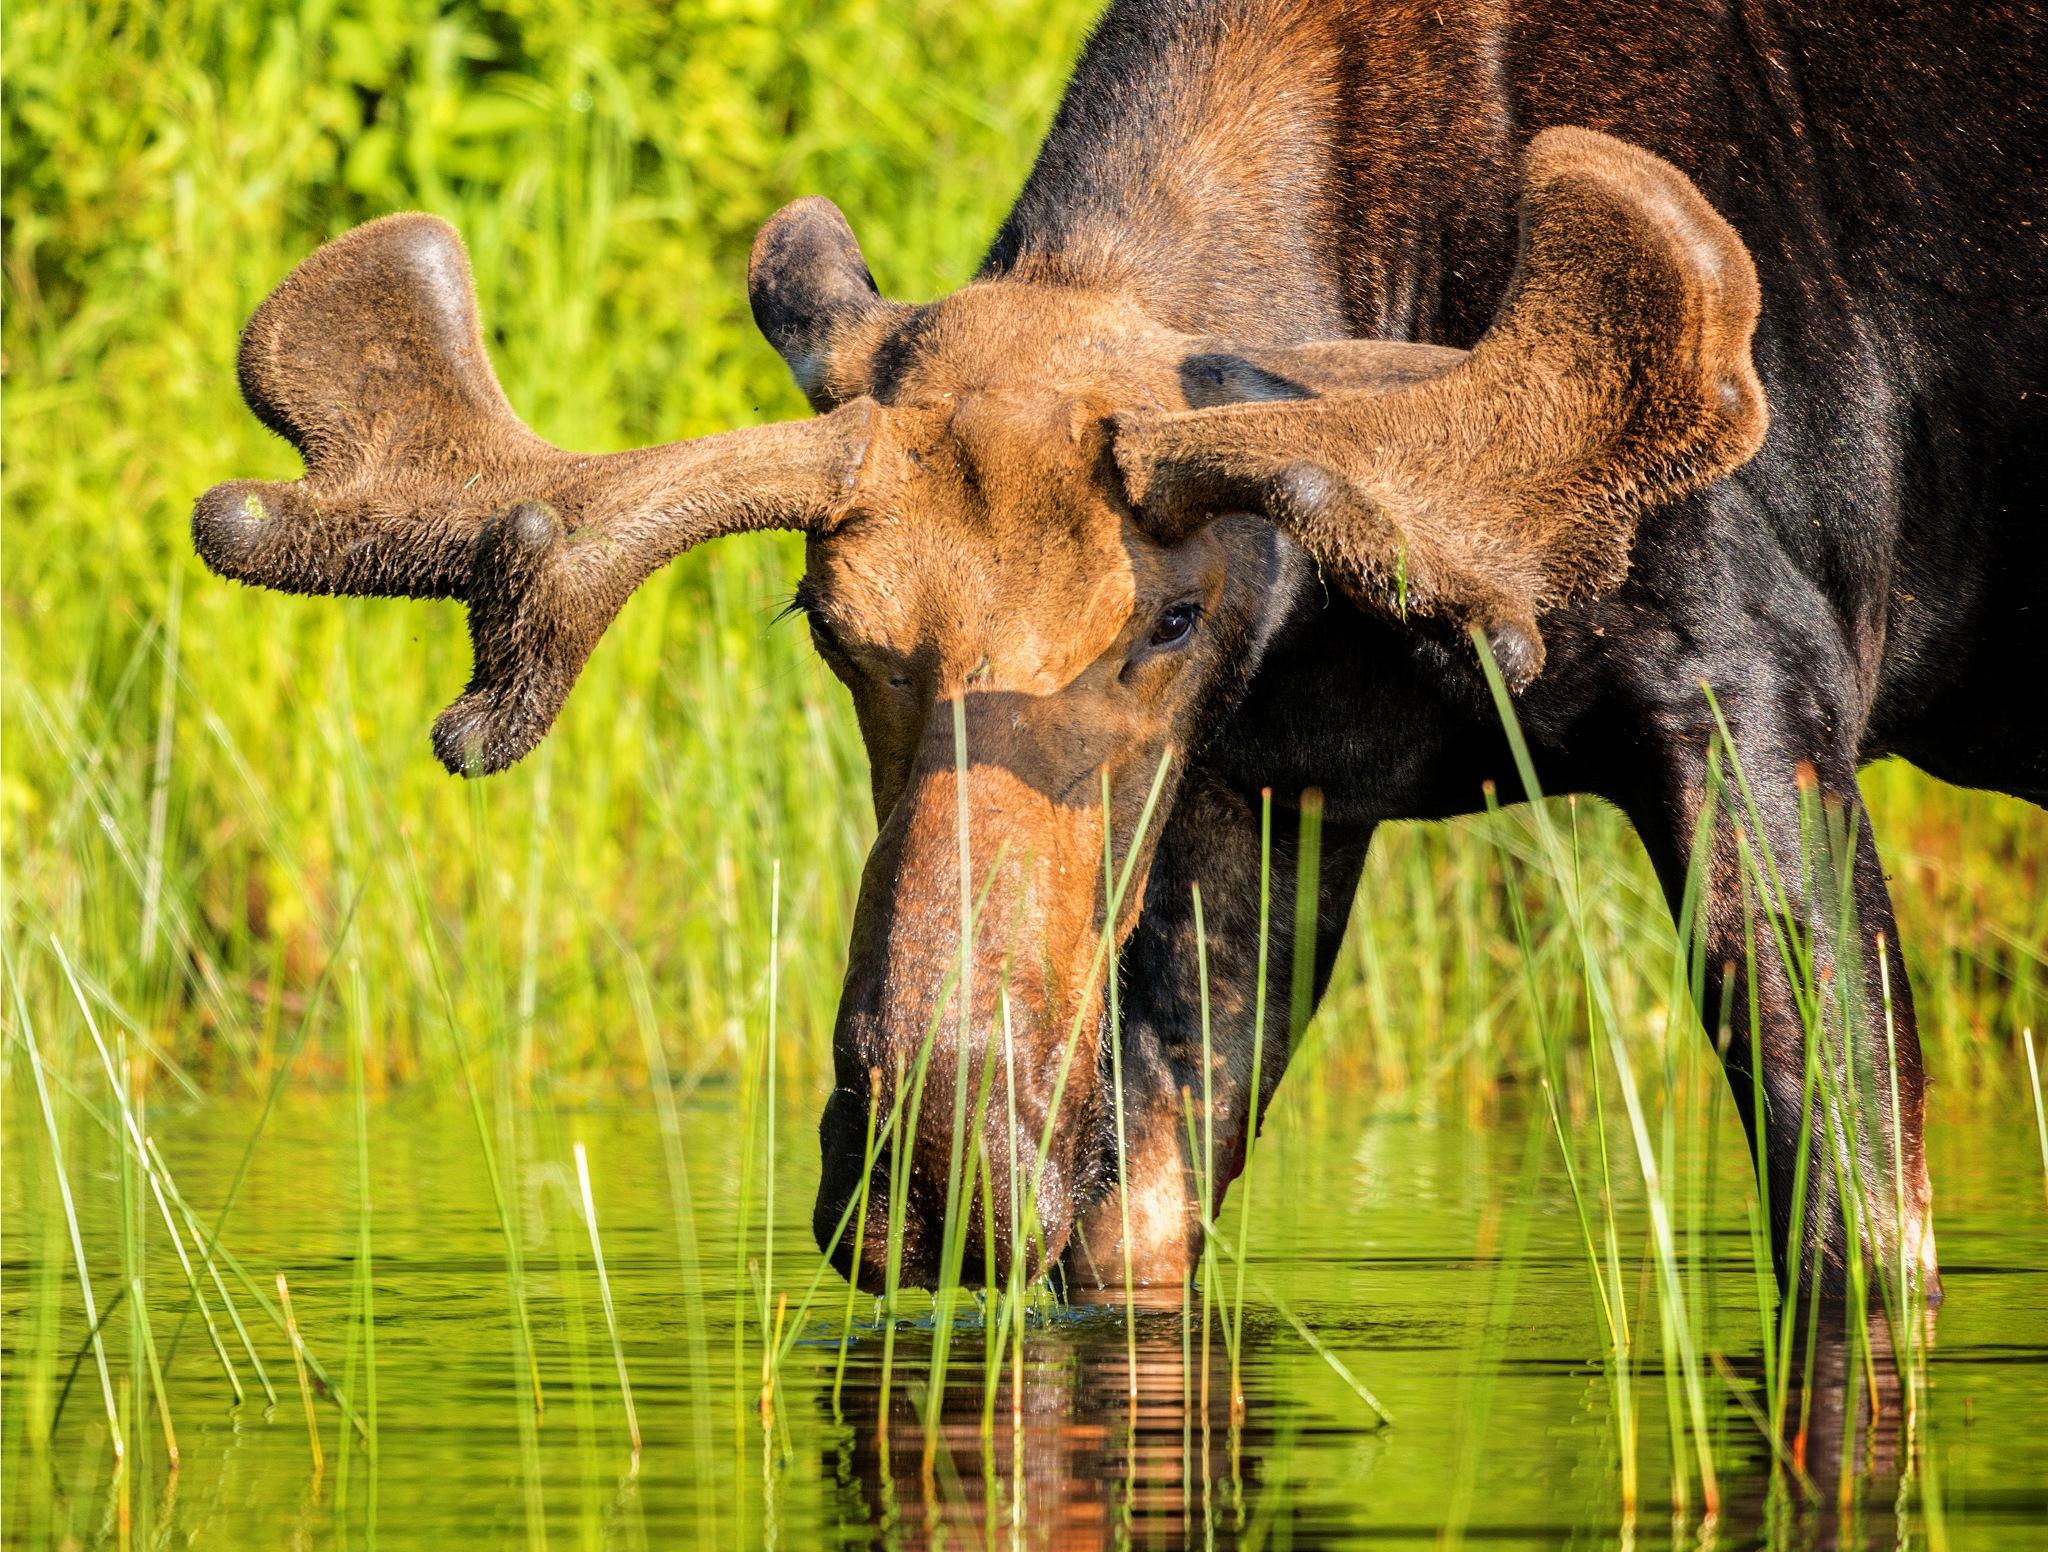 Bull Moose by almartinez